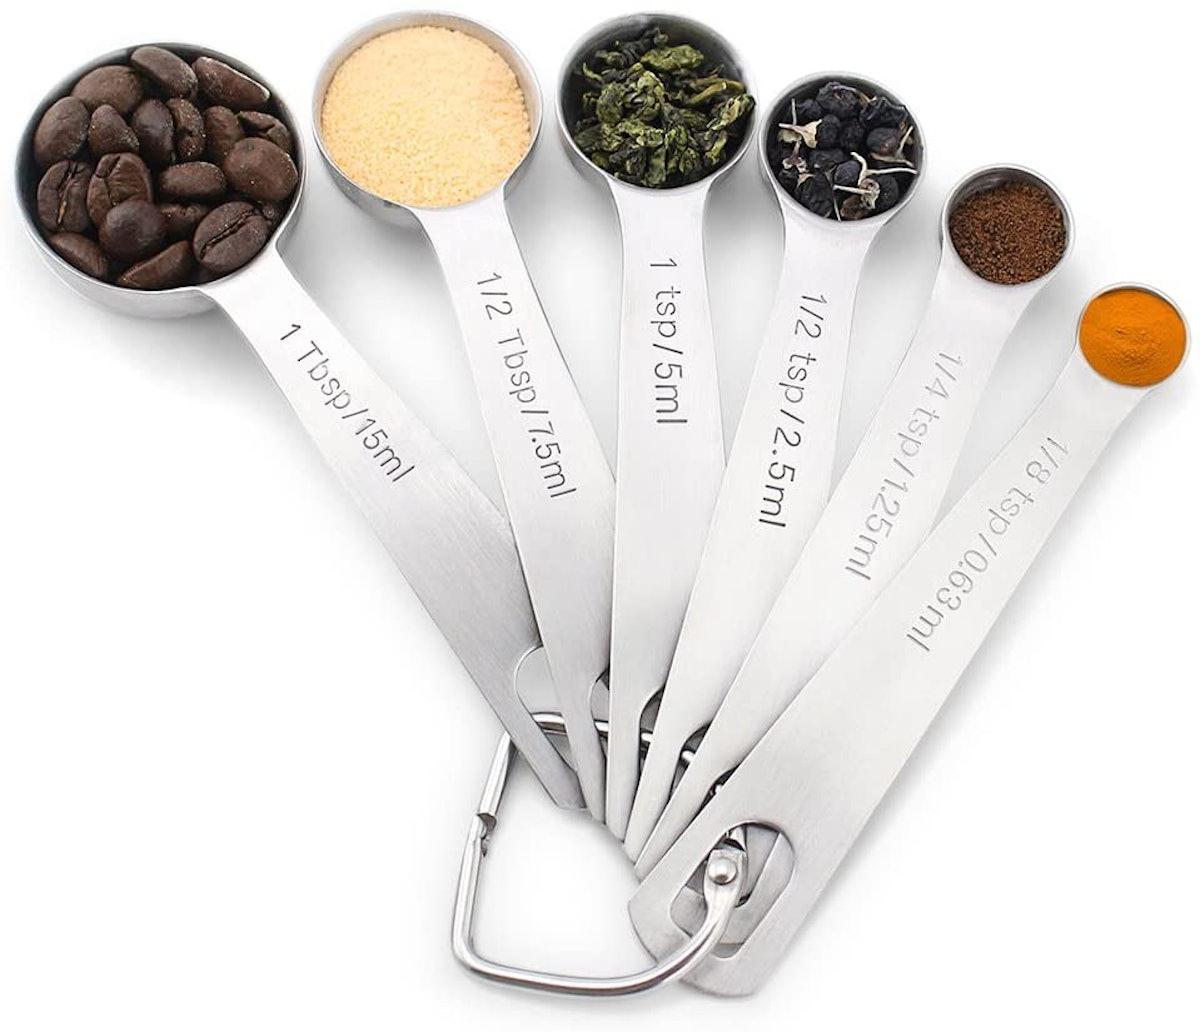 1Easylife 18/8 Stainless Steel Measuring Spoons (Set of 6)